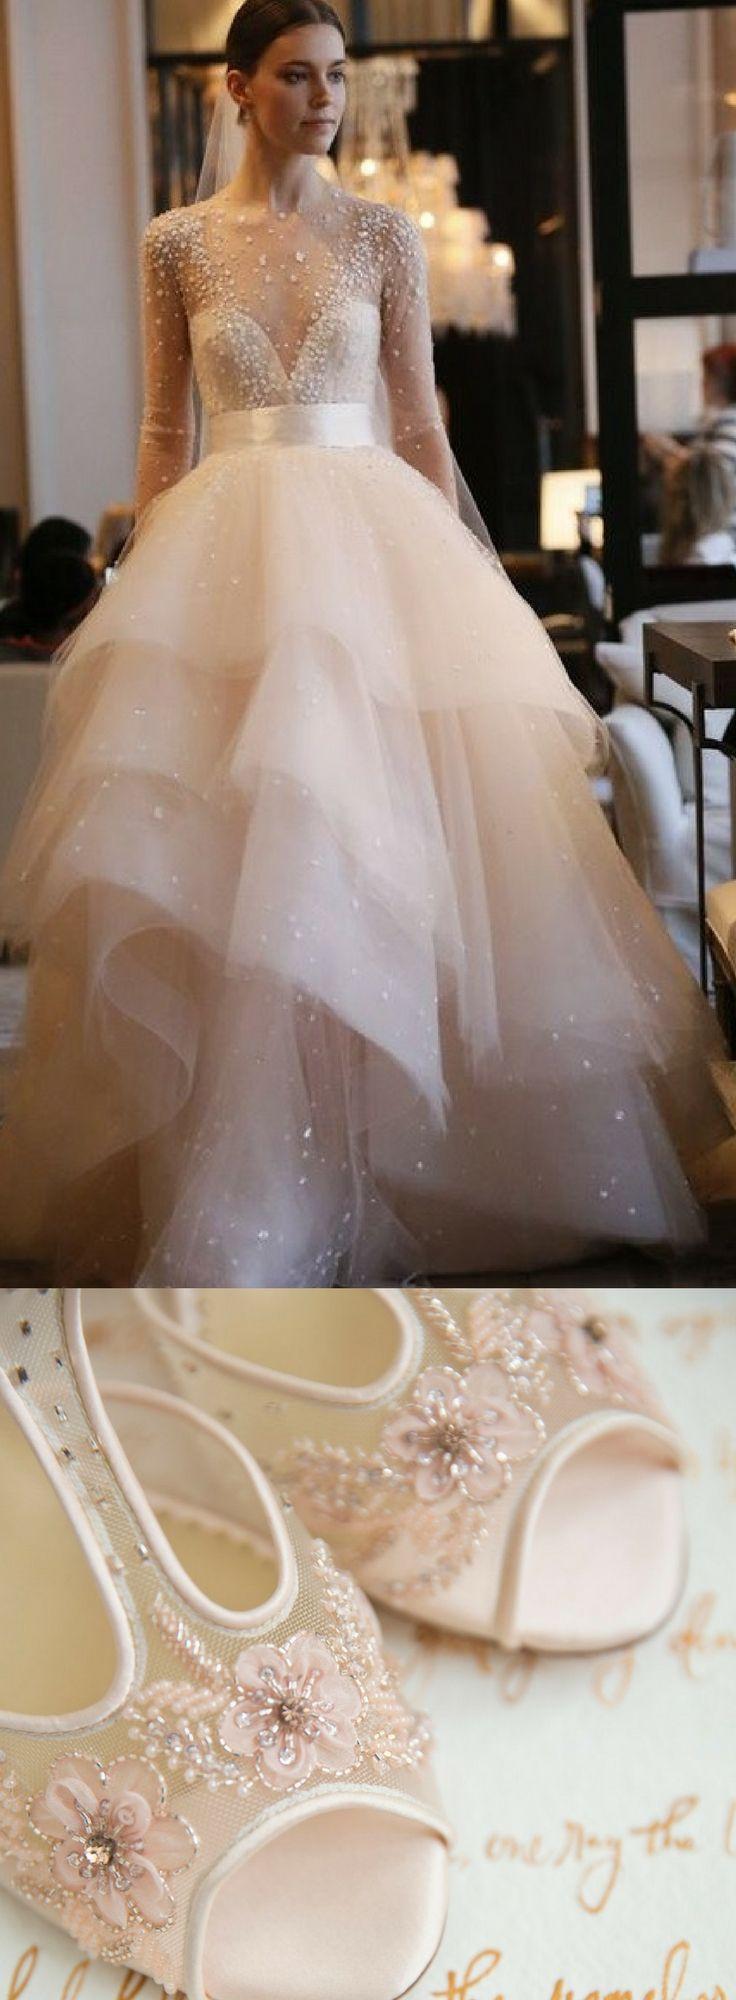 Tstrap beaded wedding shoes paloma blush swiss dot bridal